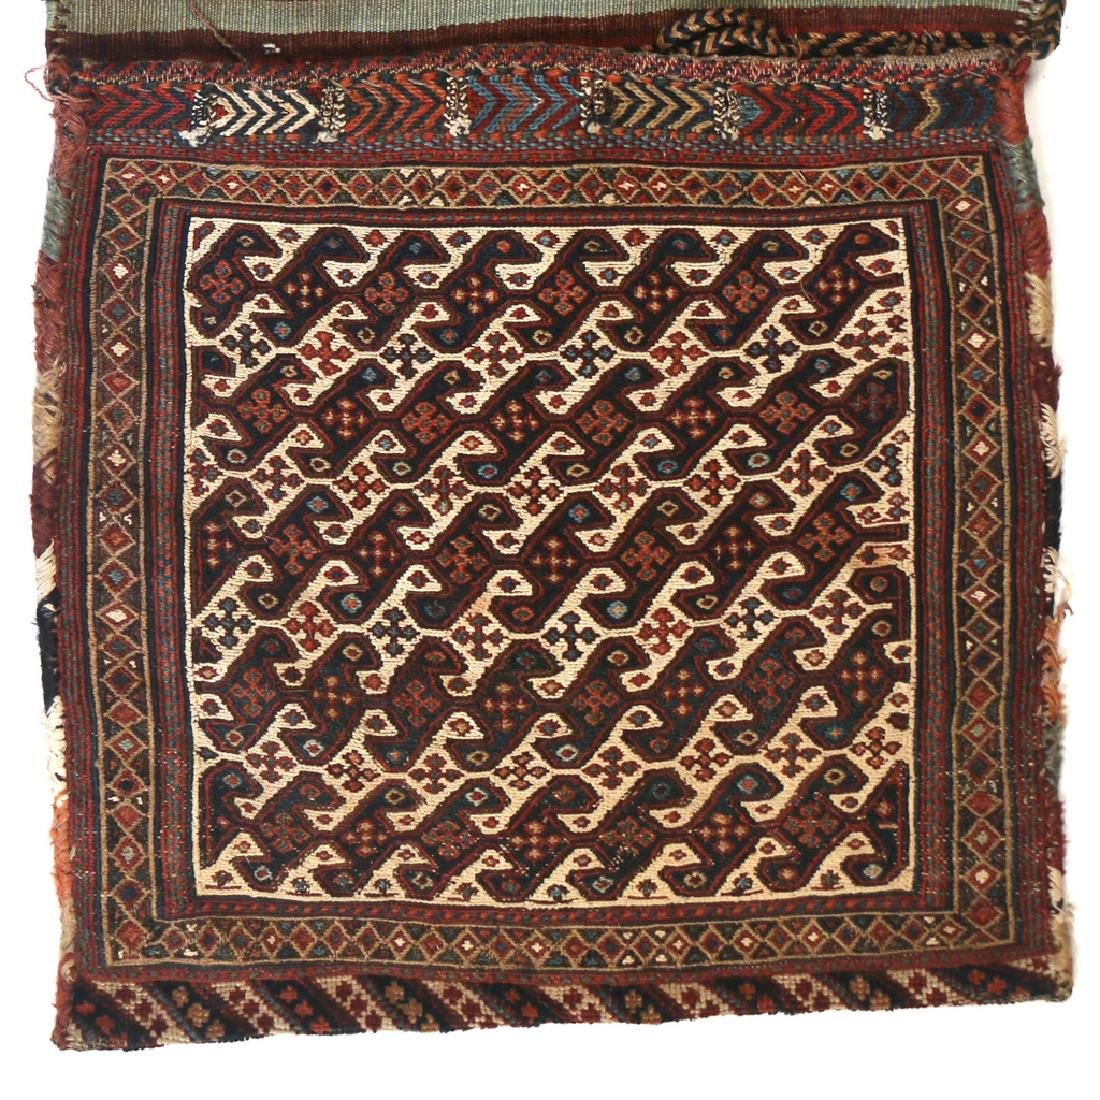 AFSHAR SOUMAC SADDLEBAGS - 2